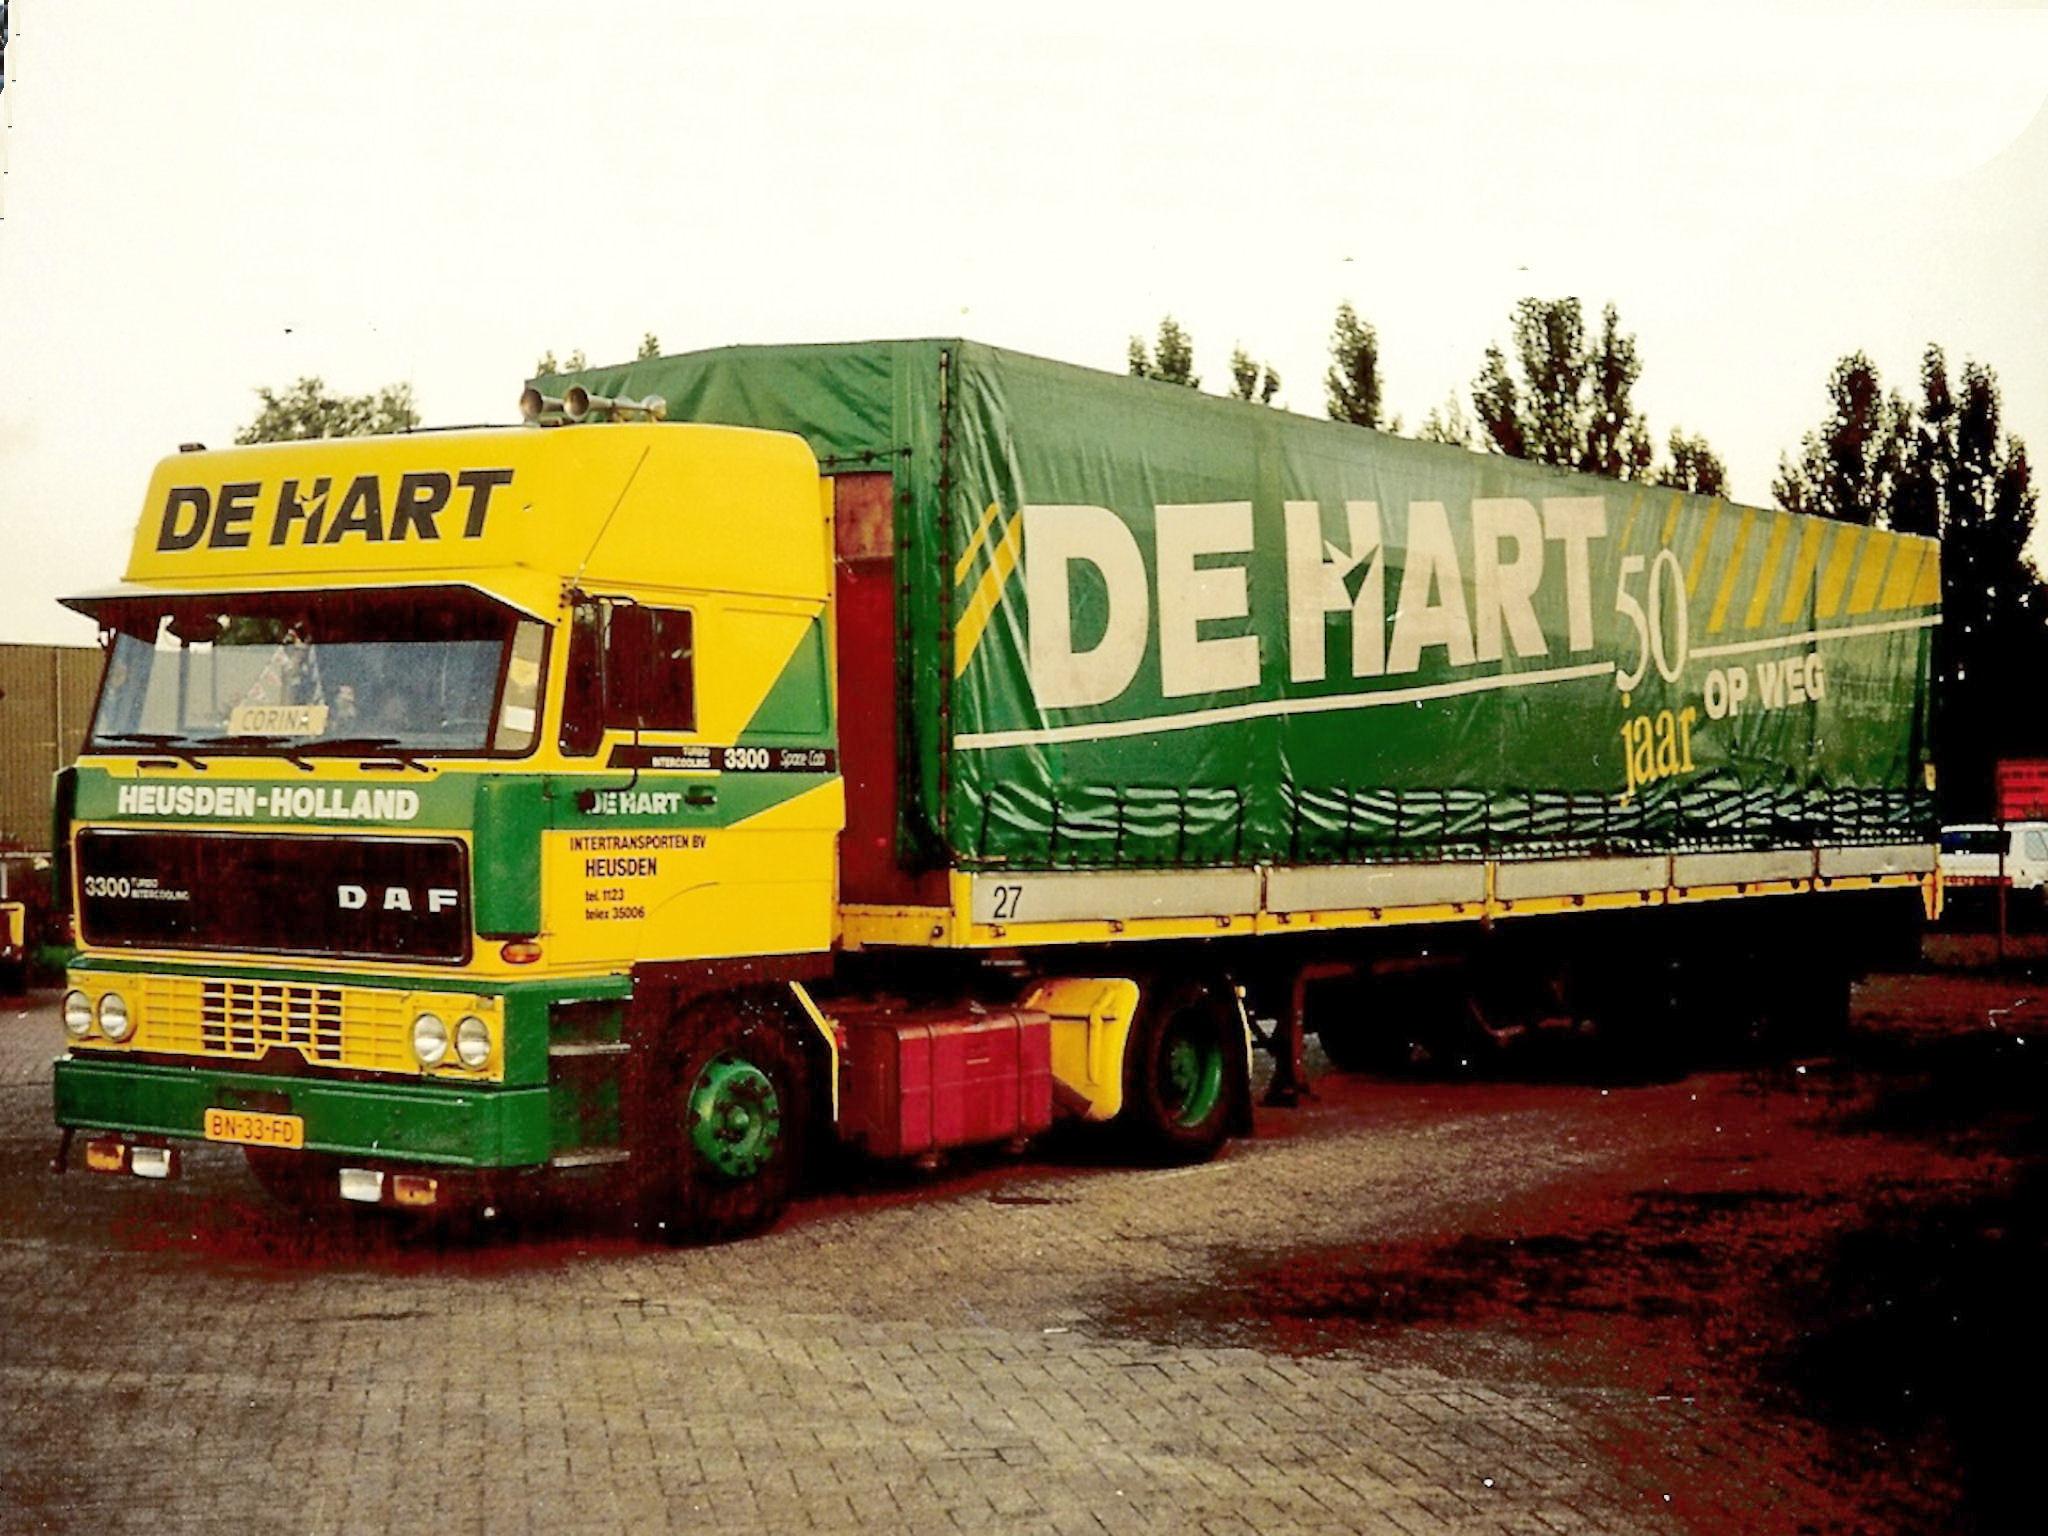 DAF-3300-Space-cap-John-Van-Andel-archief